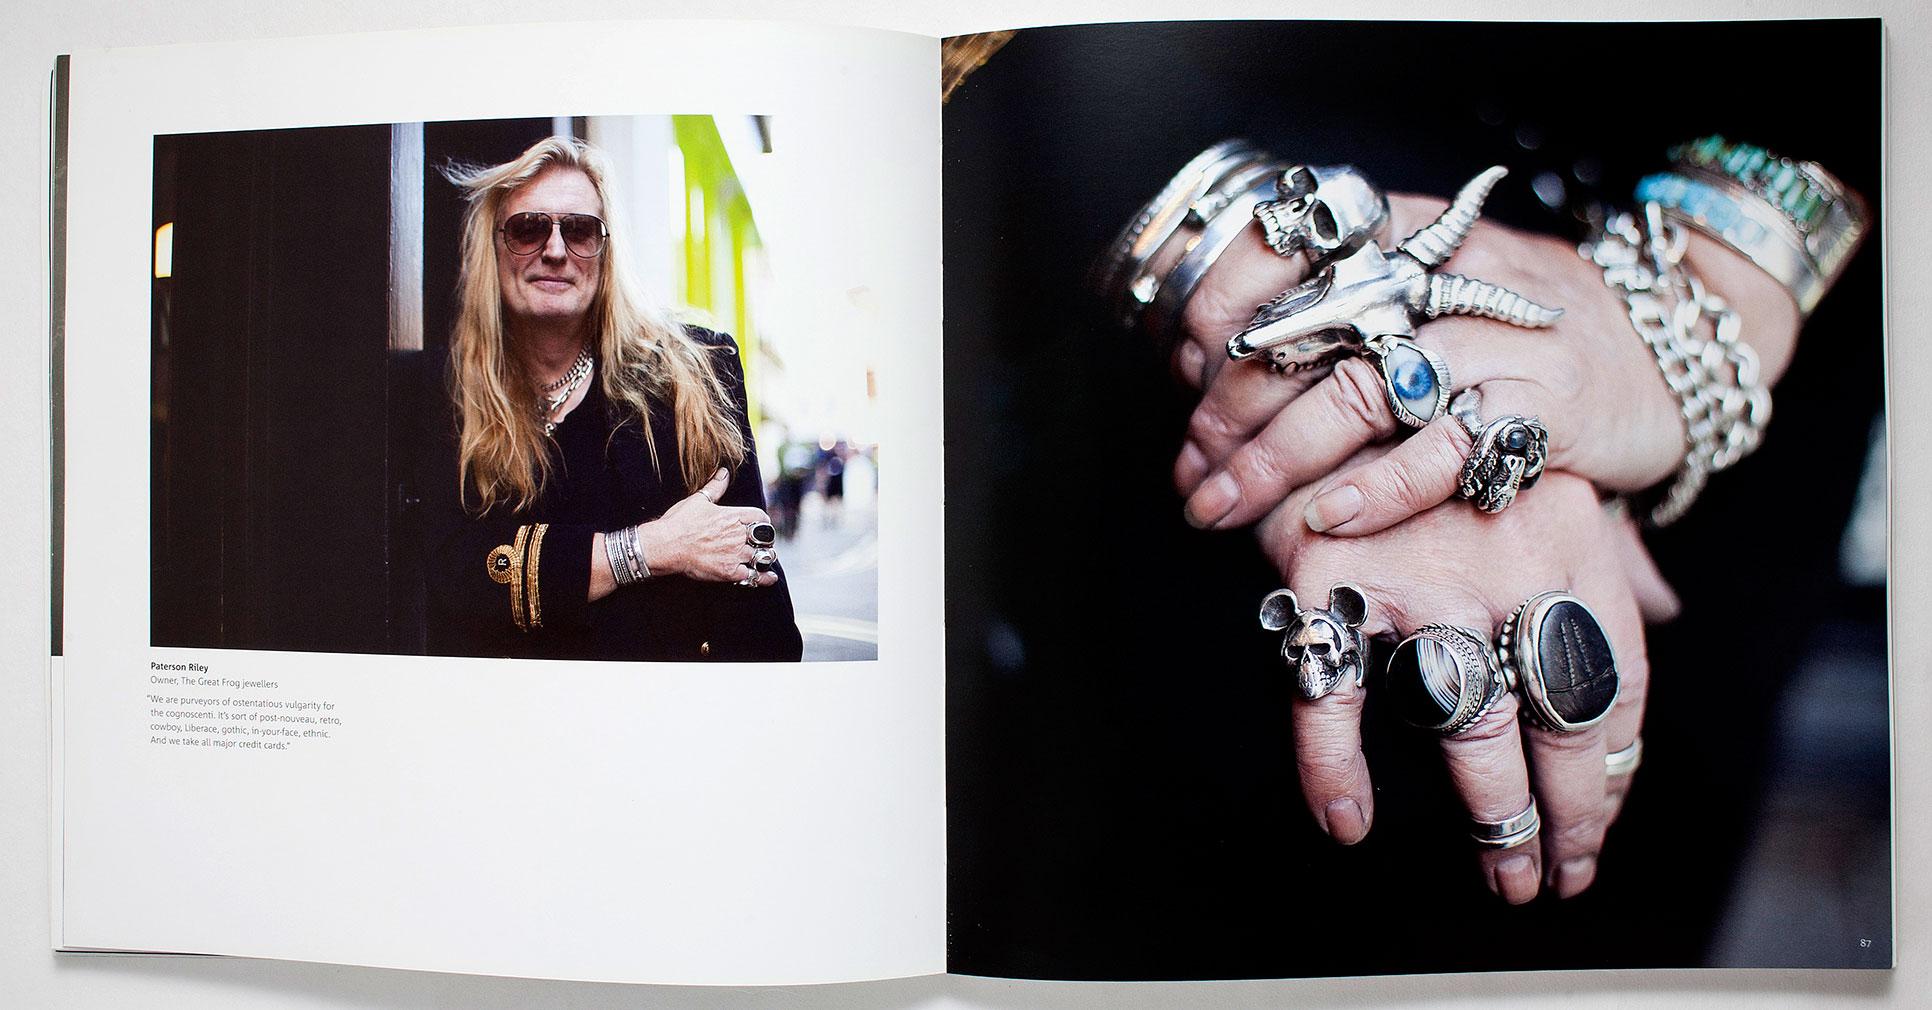 epm-print-management-bristol-photography-books-soho-lives-3.jpg